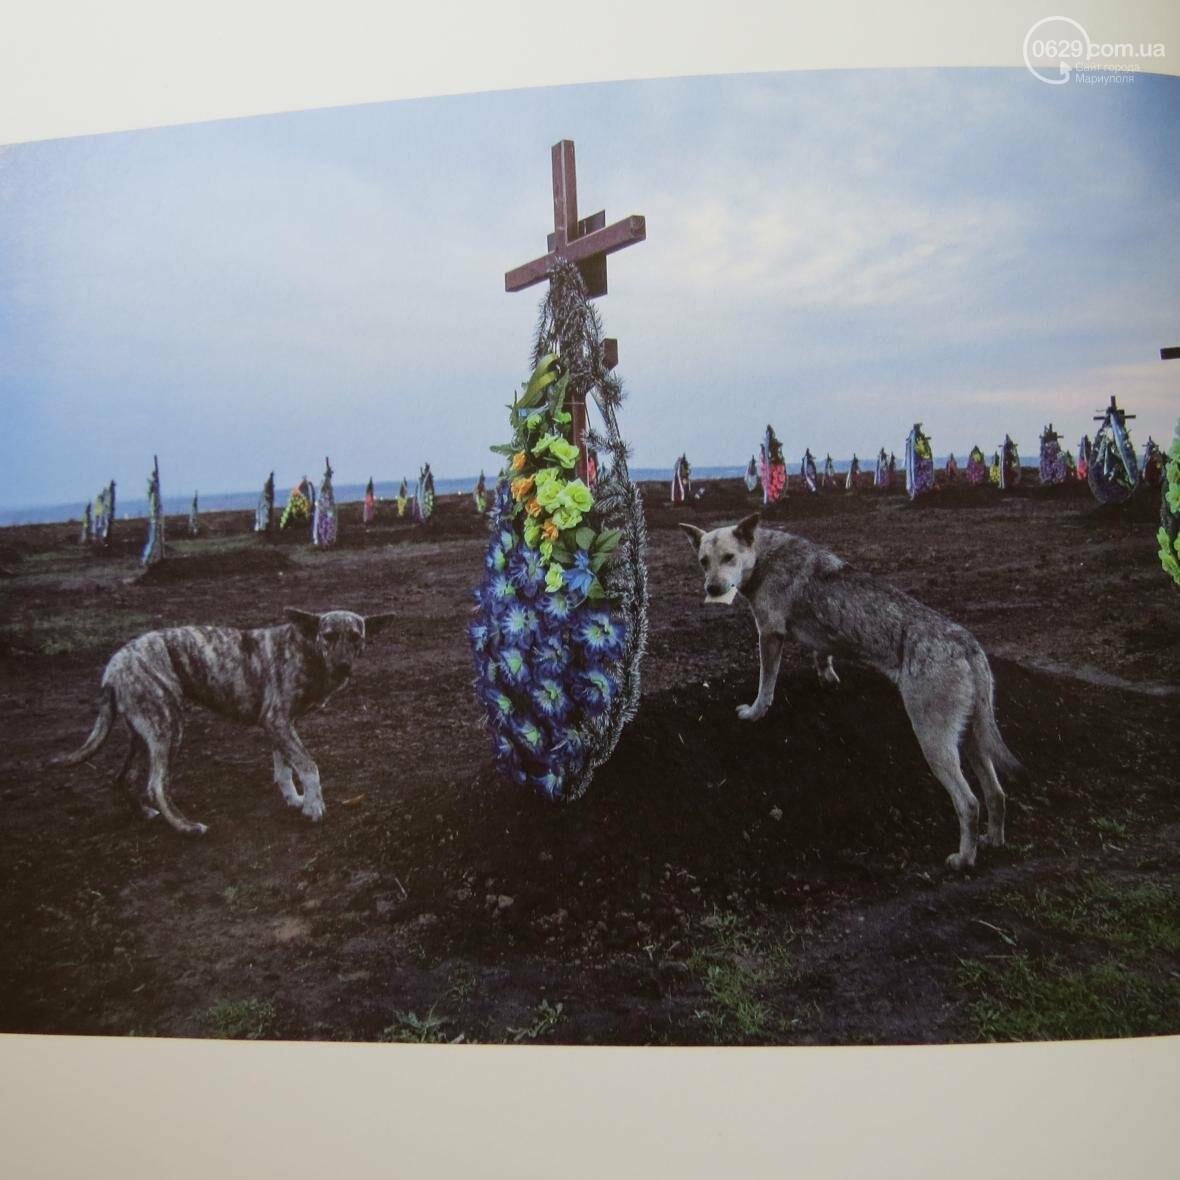 18.04.2015 года, Днепр - Александр Ратушняк